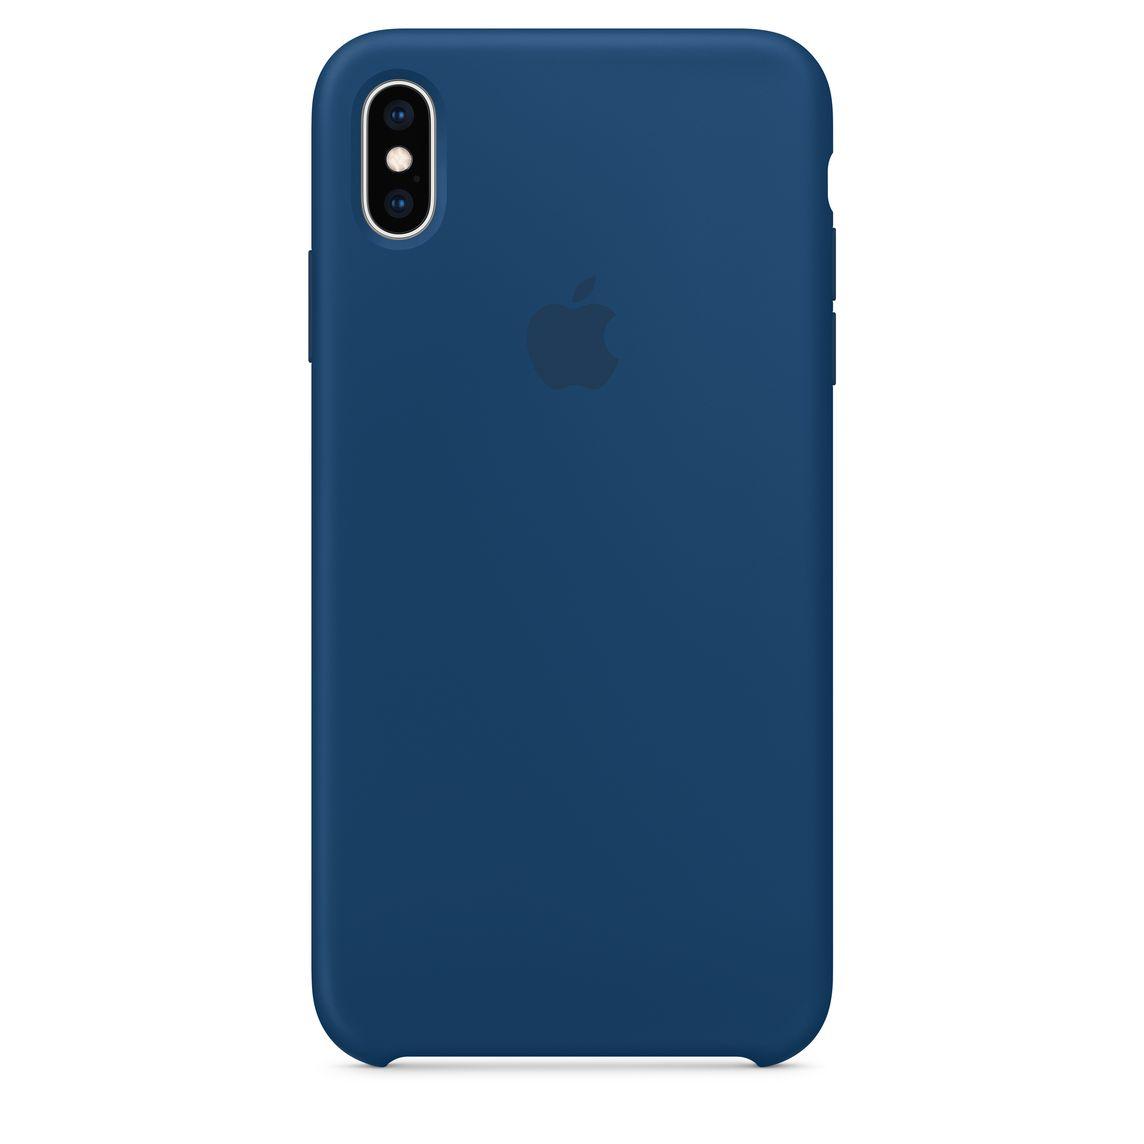 new concept 9047d d7603 iPhone XS Max Silicone Case - Blue Horizon